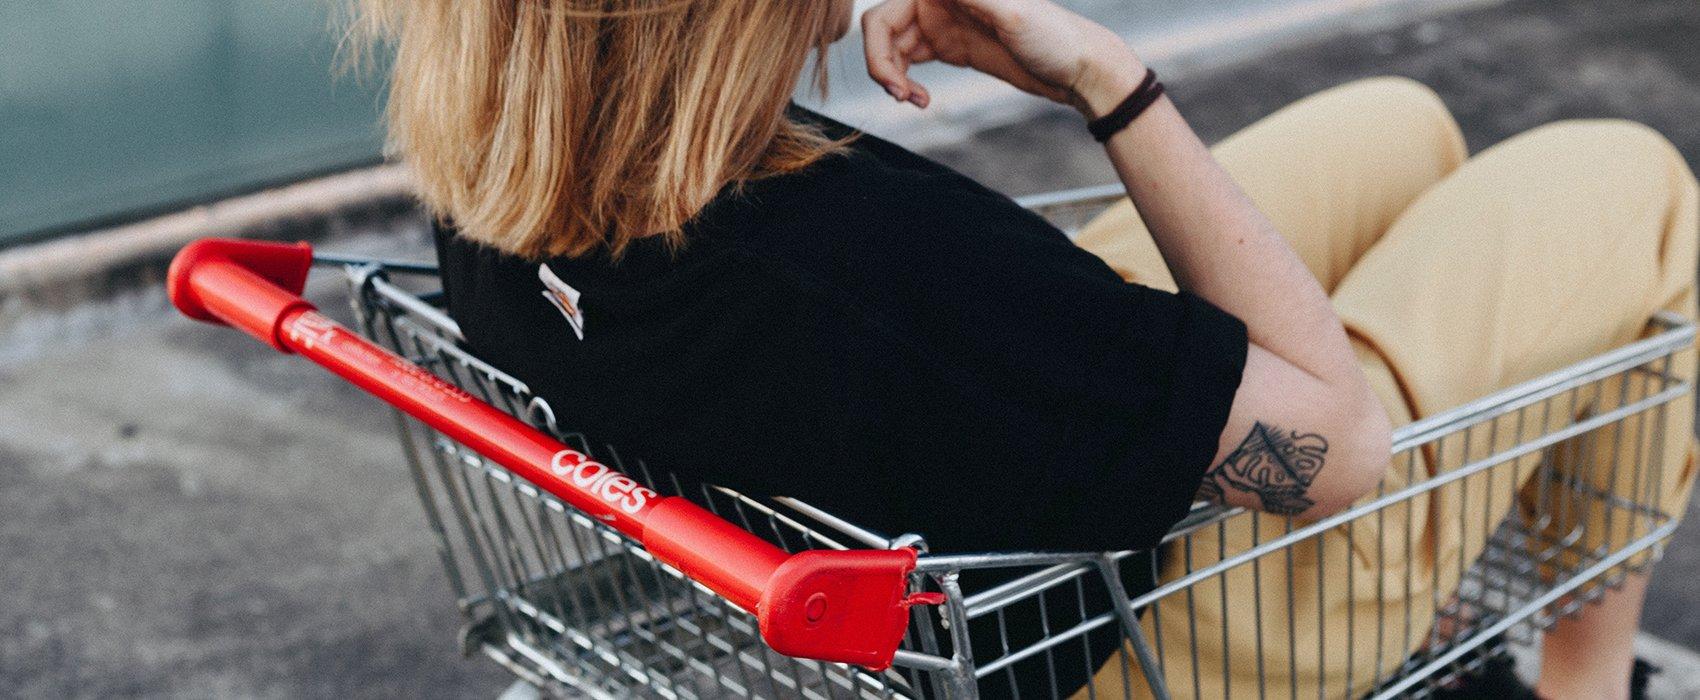 Marketing Trends - Social Shopping